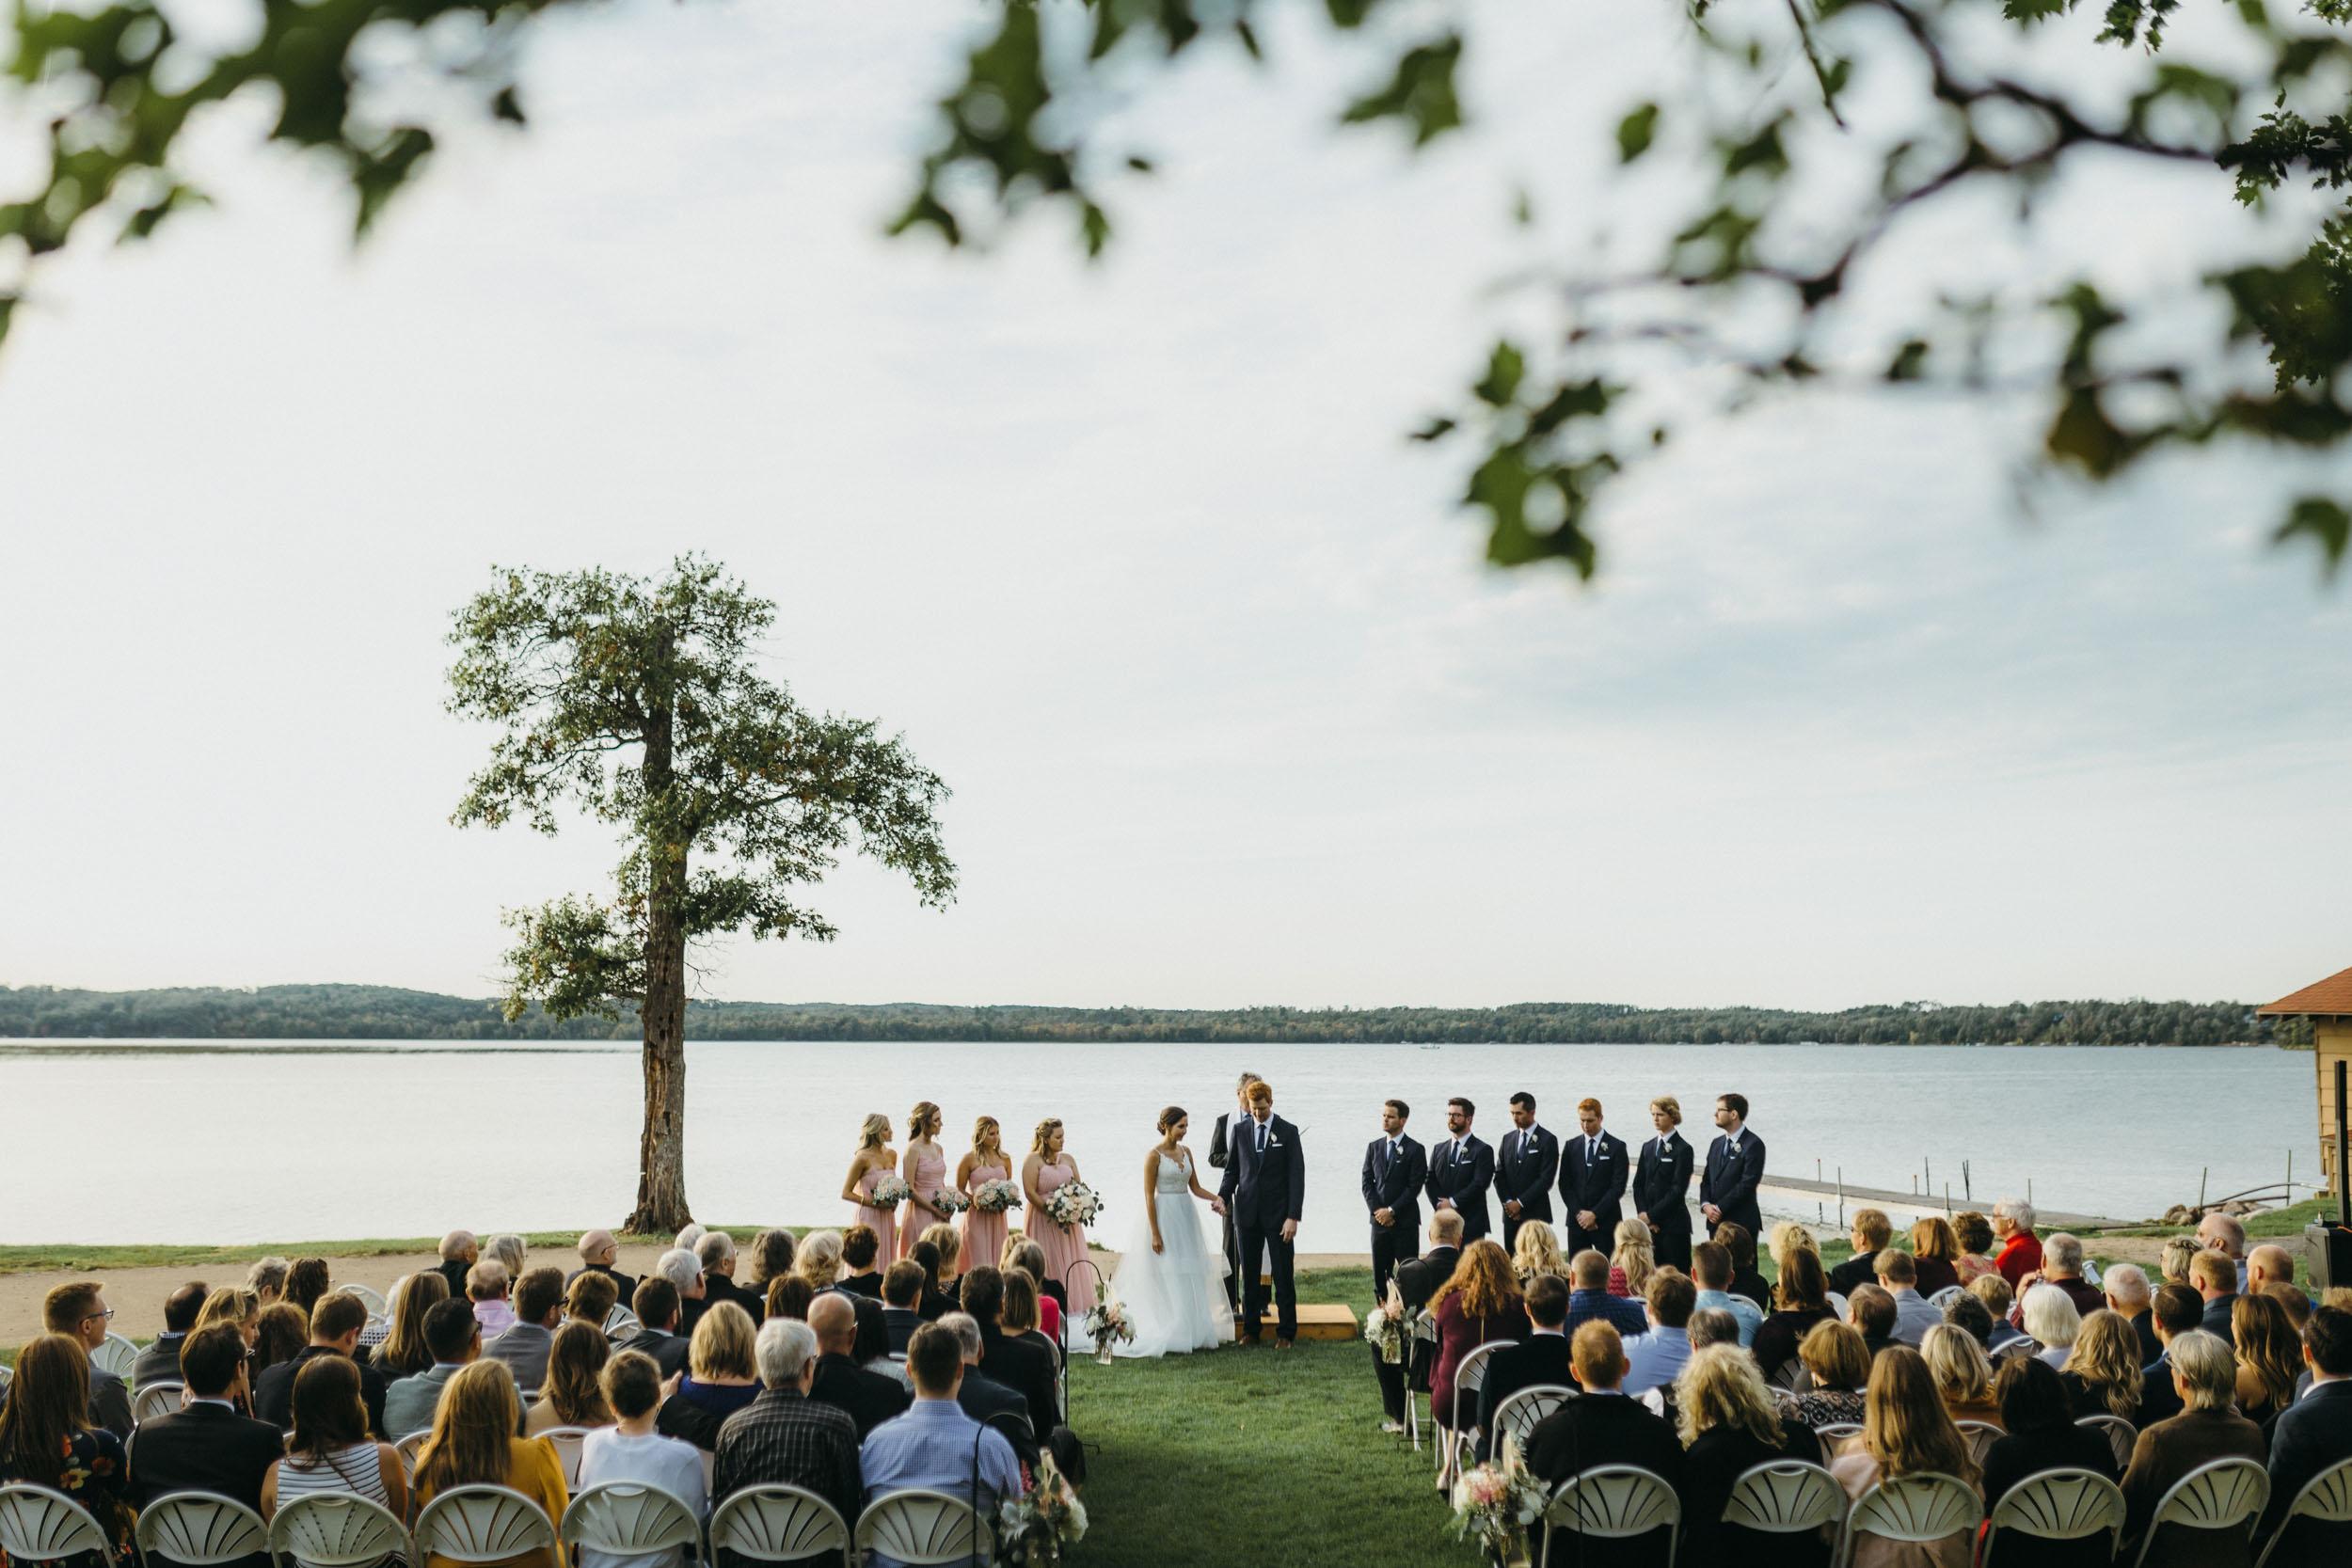 46-maddens resort minnesota outdoor ceremony wedding photographer-1.jpg